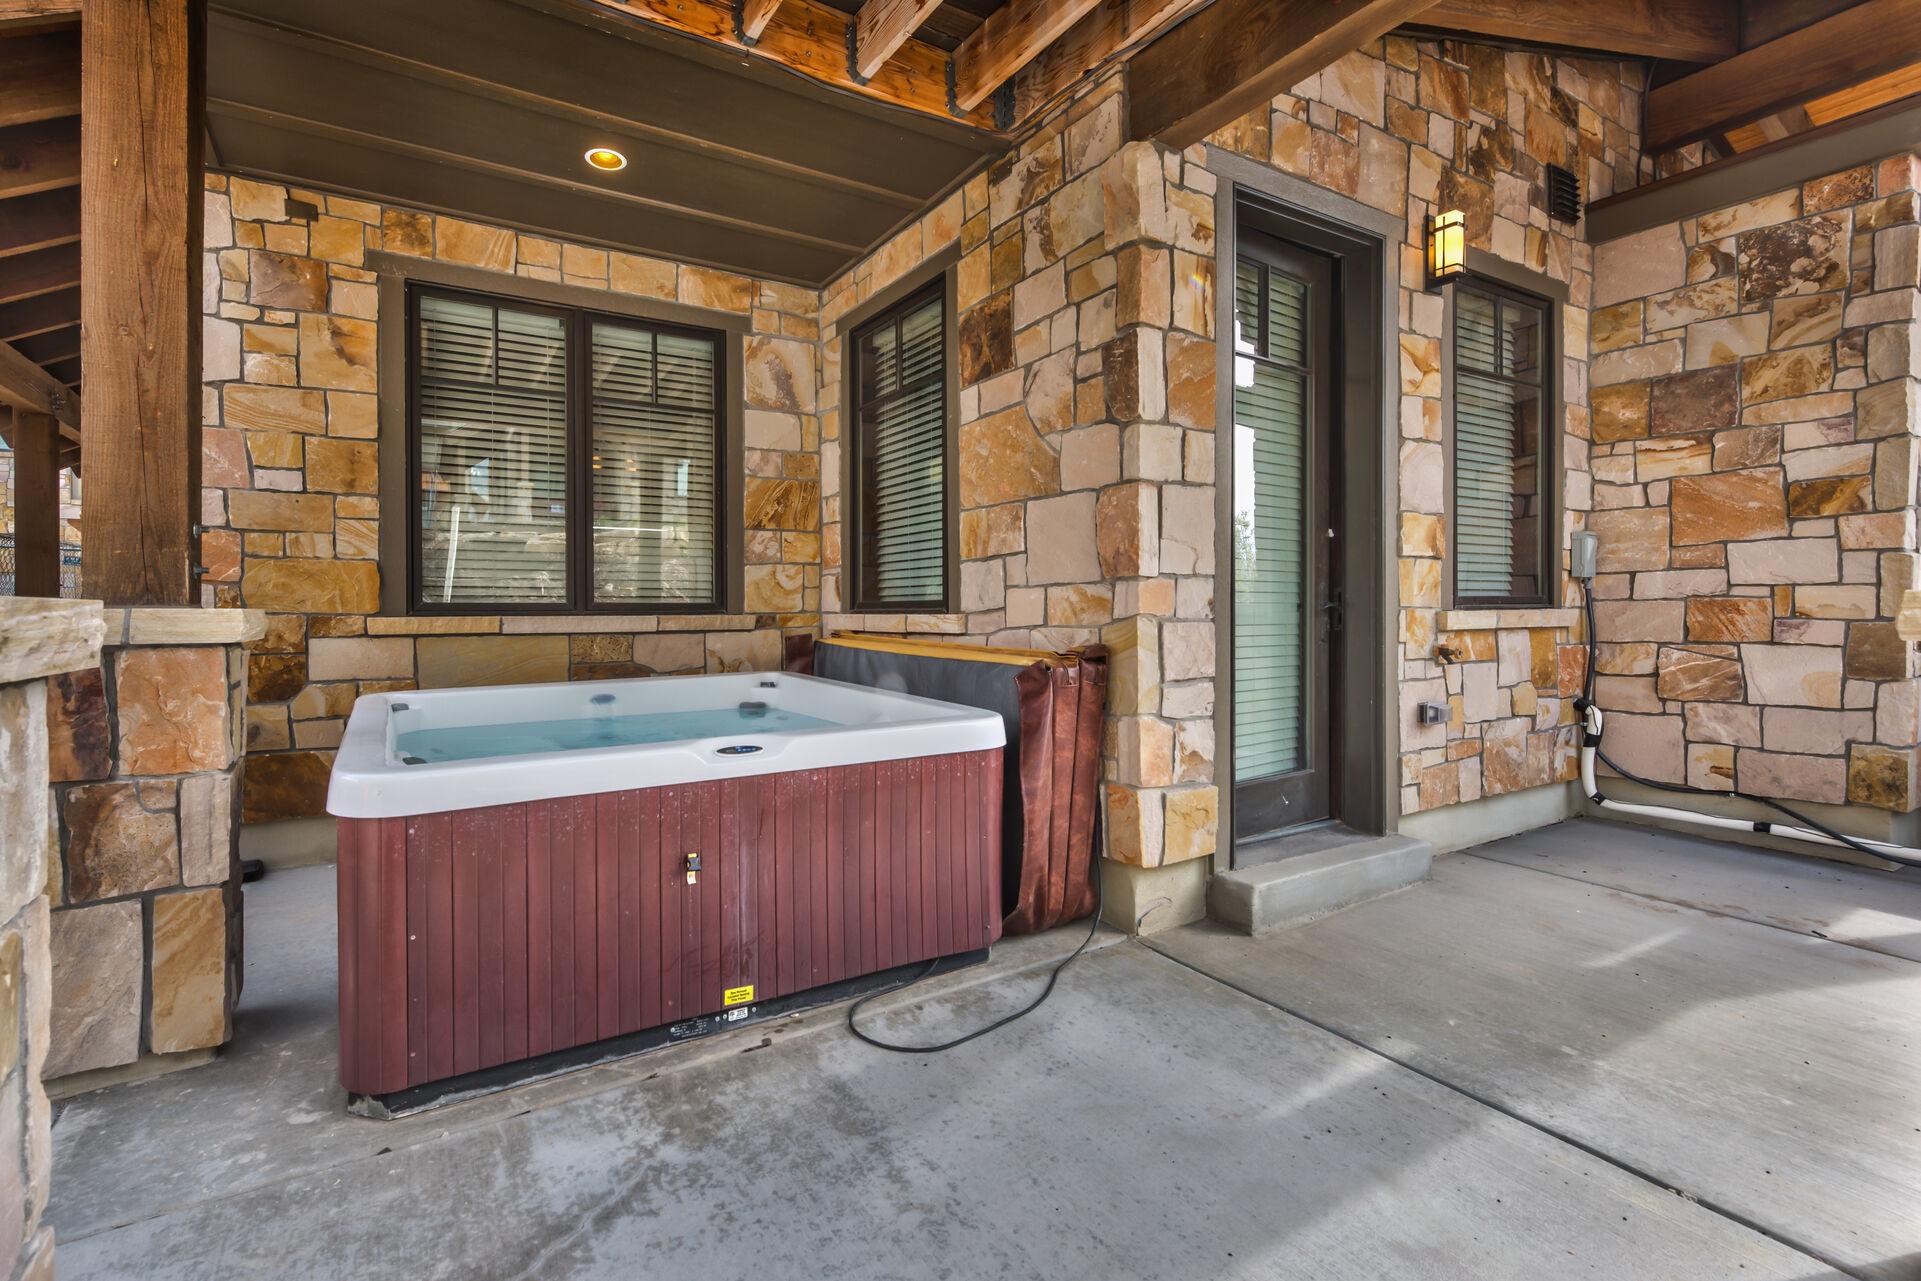 6-Seat Private Hot Tub